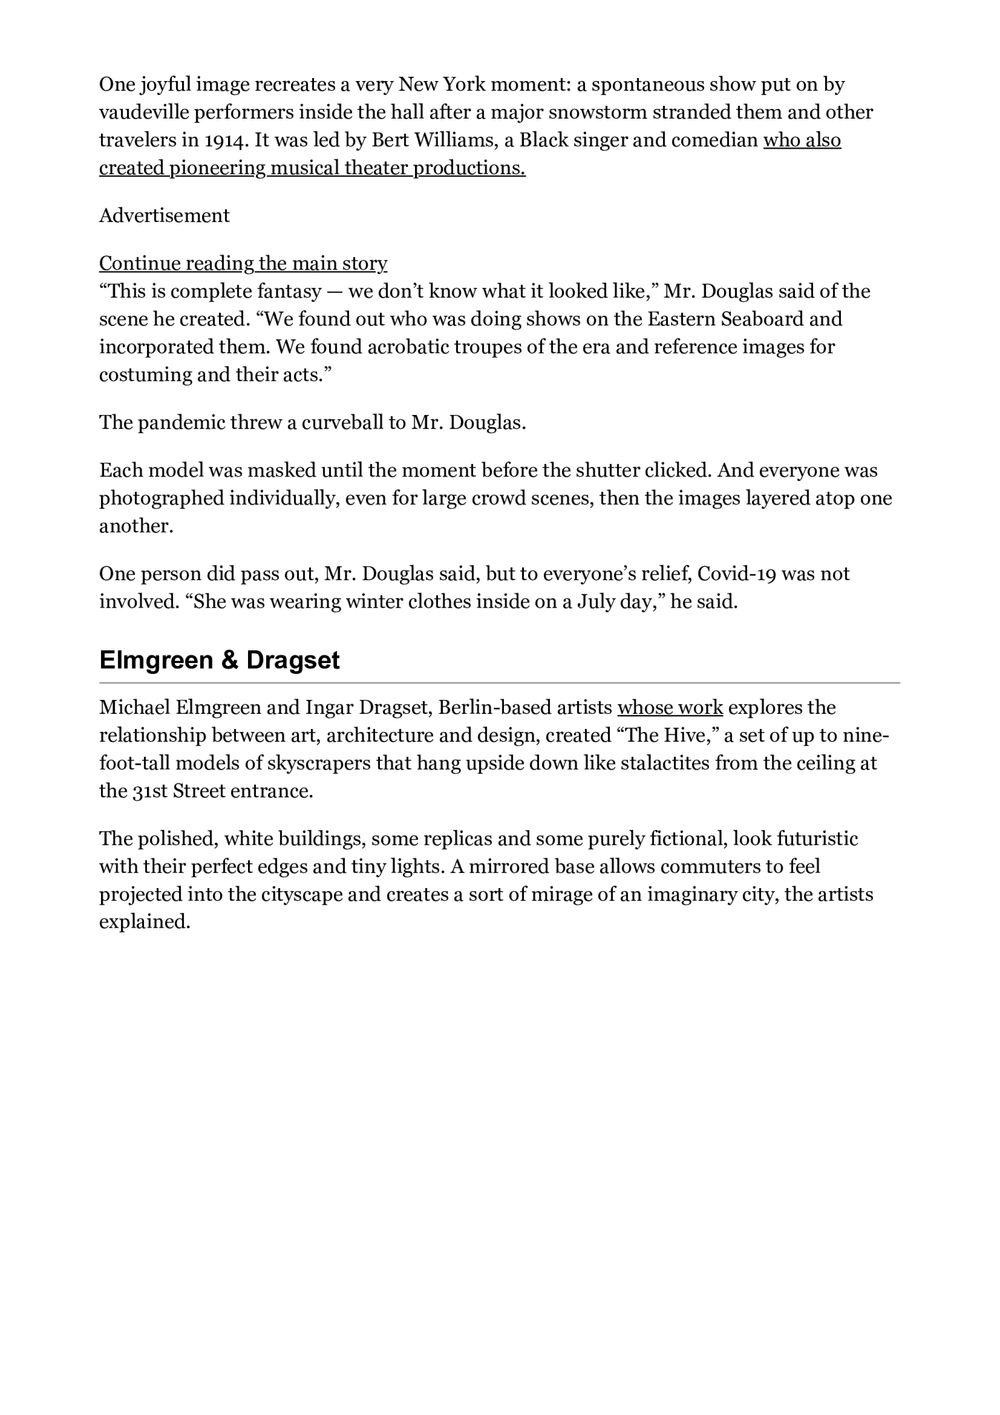 The New York Times | ELMGREEN & DRAGSET